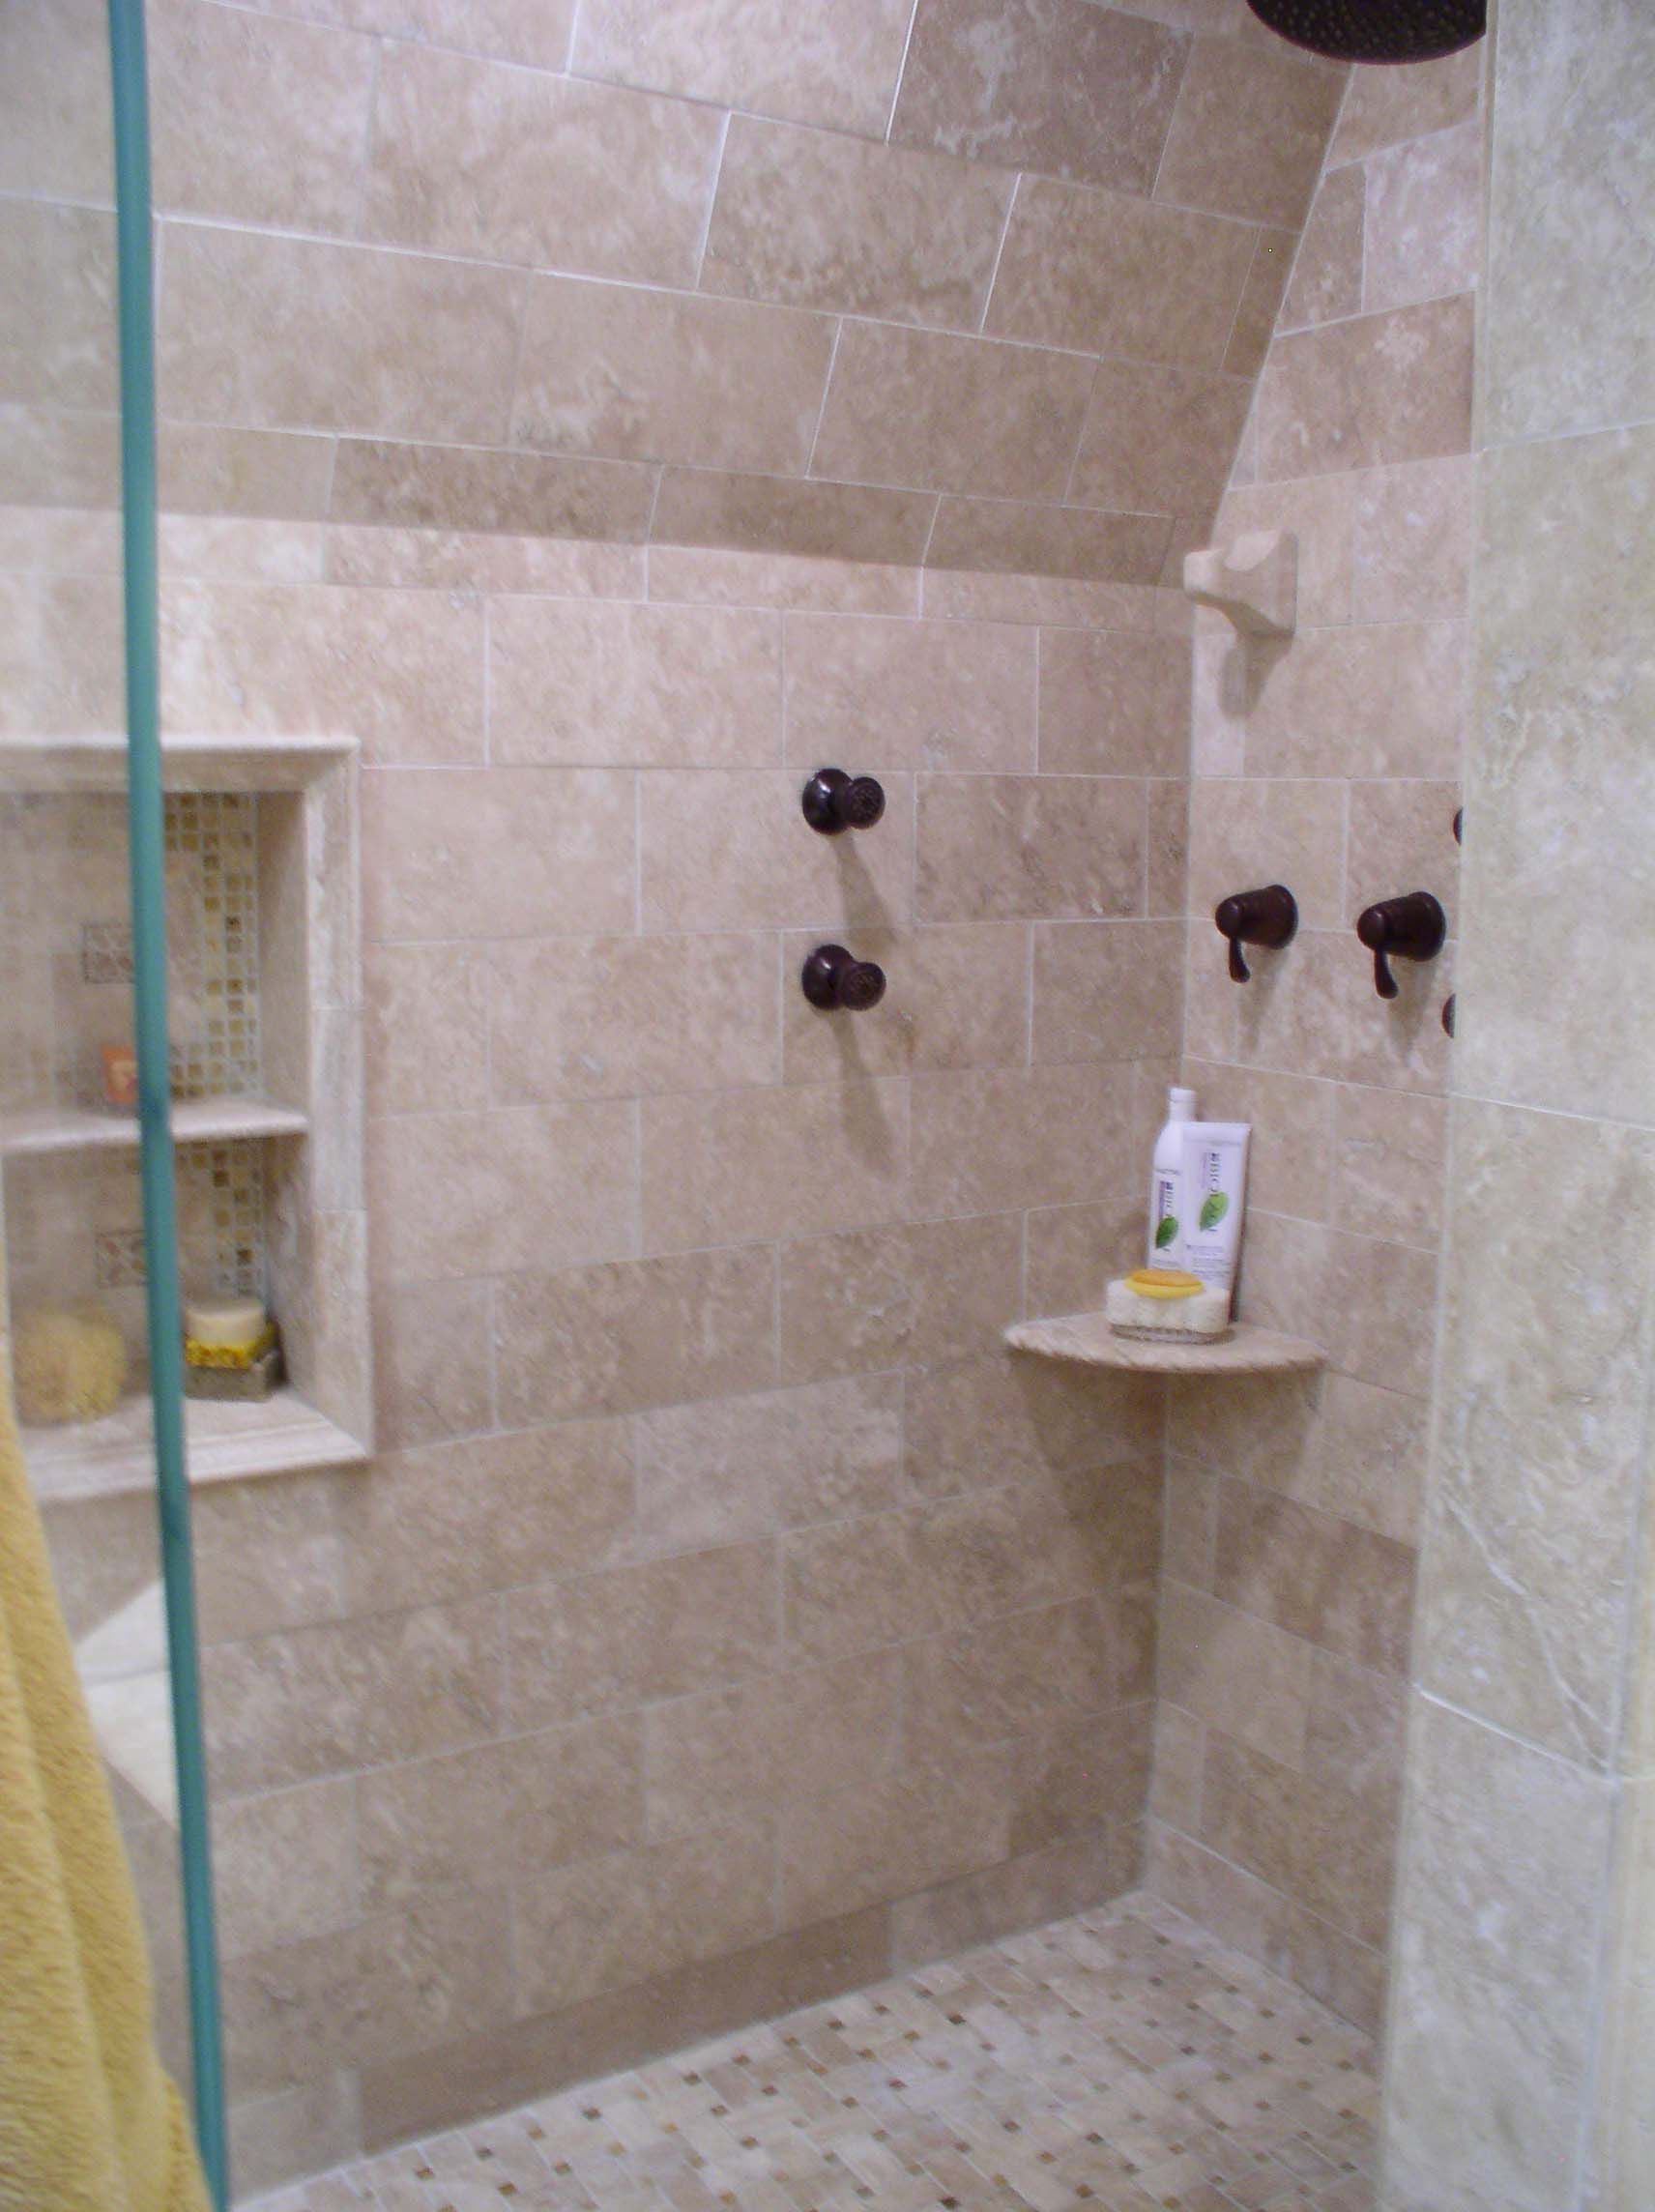 Dgo bath BW floor rope shelves.jpg